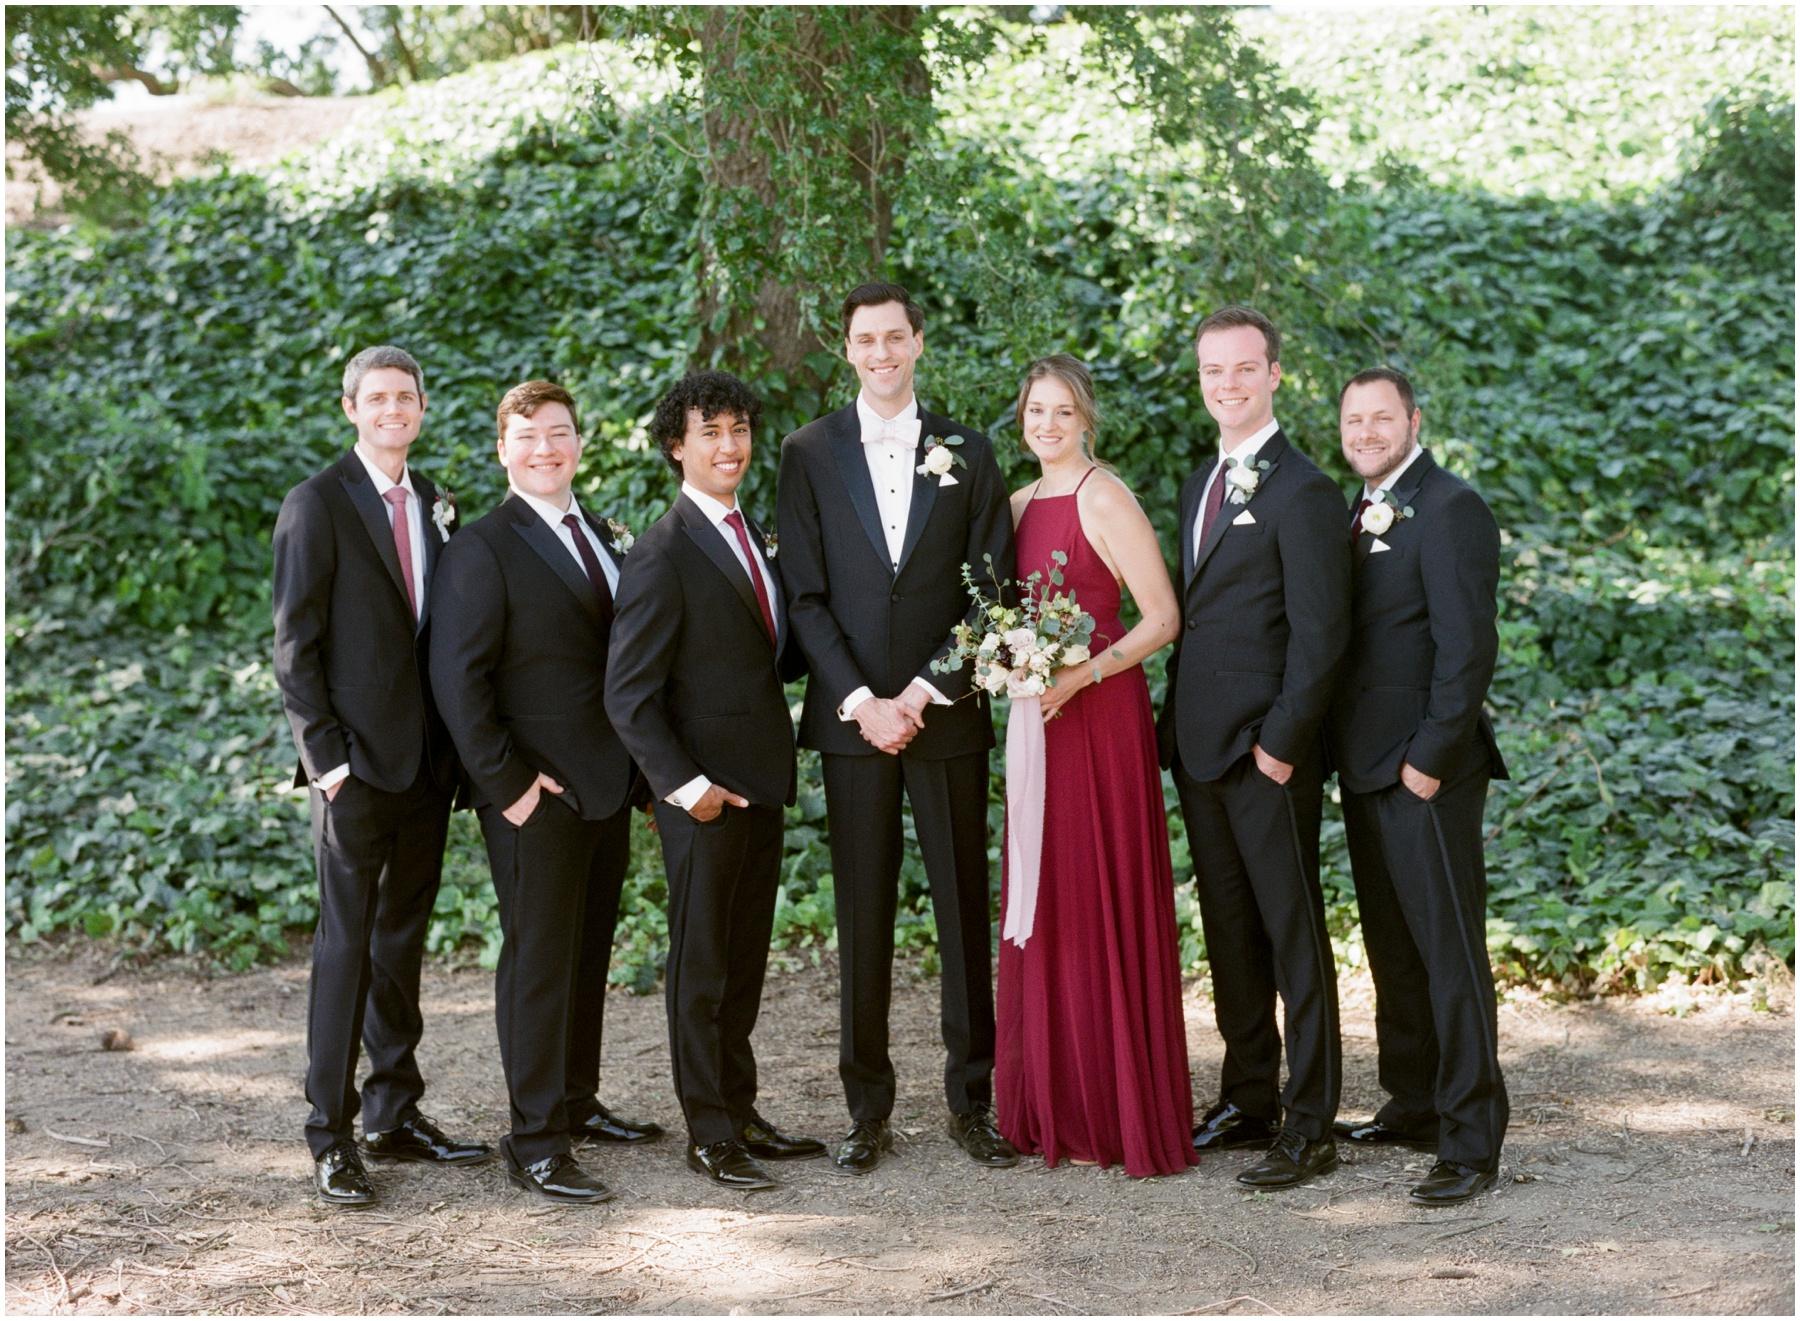 Scribner-bend-vineyards-wedding-sacramento-california-Kristine-Herman-Photography-81.jpg